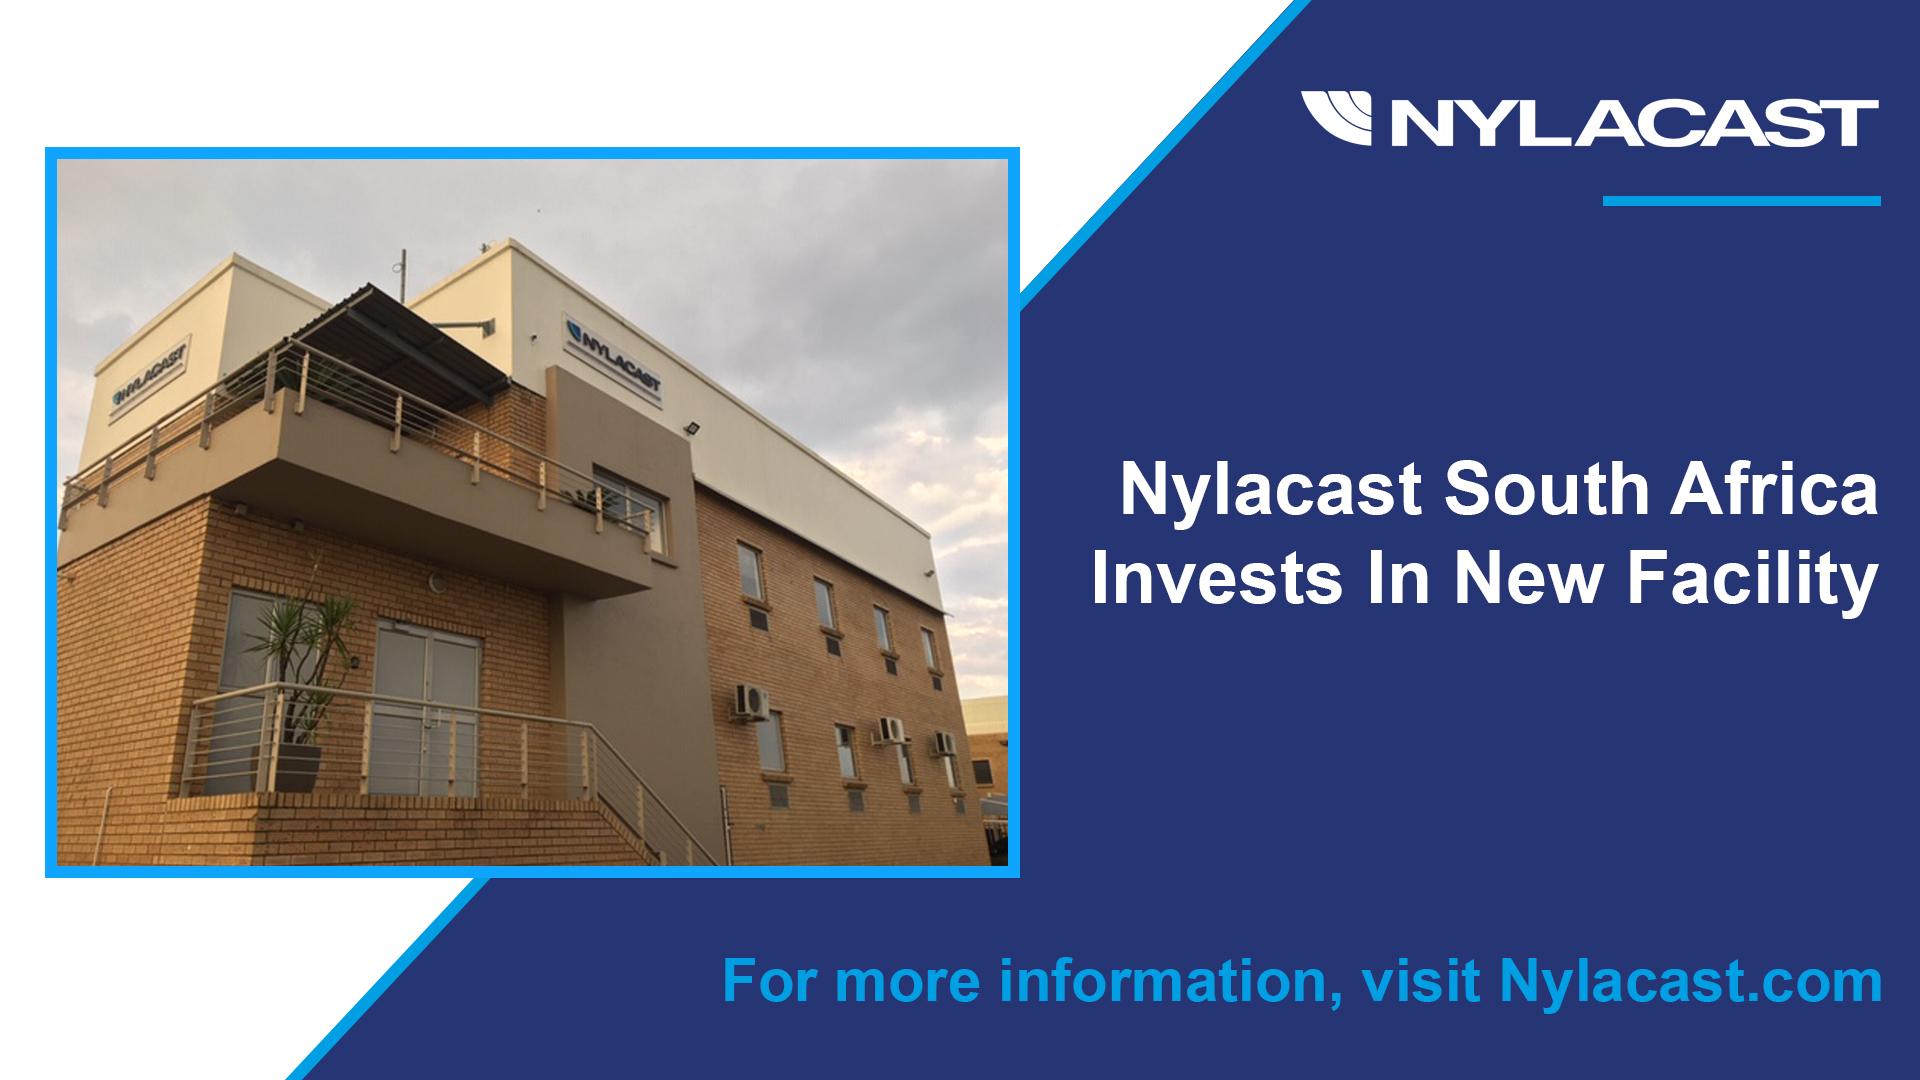 Nylacast South Africa new facility